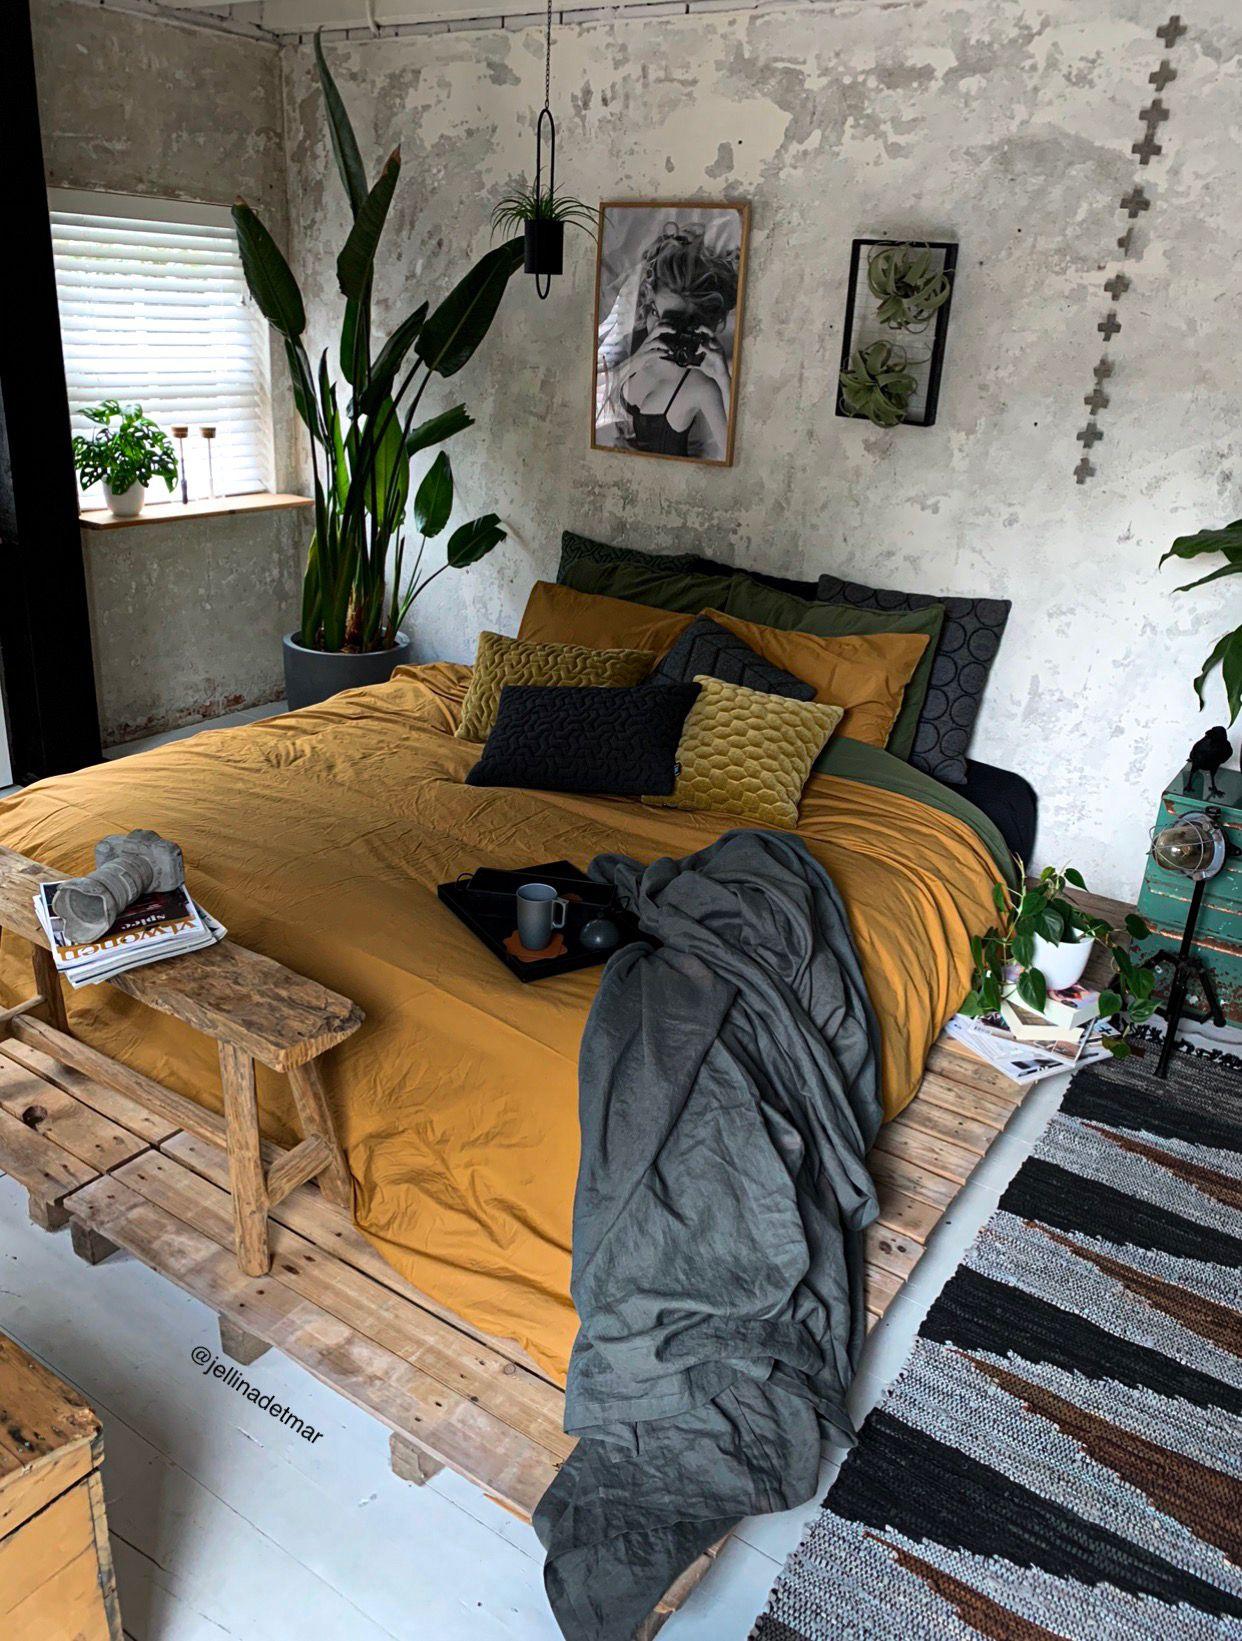 My bedroom @jellinadetmar #bedroom#bedroomdetails#bedroominspo#bedroomwall#beddingset#walldeco#bedroomdecor#slaapkamer#classyinteriors#livingroomdecor#interiorstyling#interior_magasinet#interiormilk#shabbyyhomes#jellinadetmar